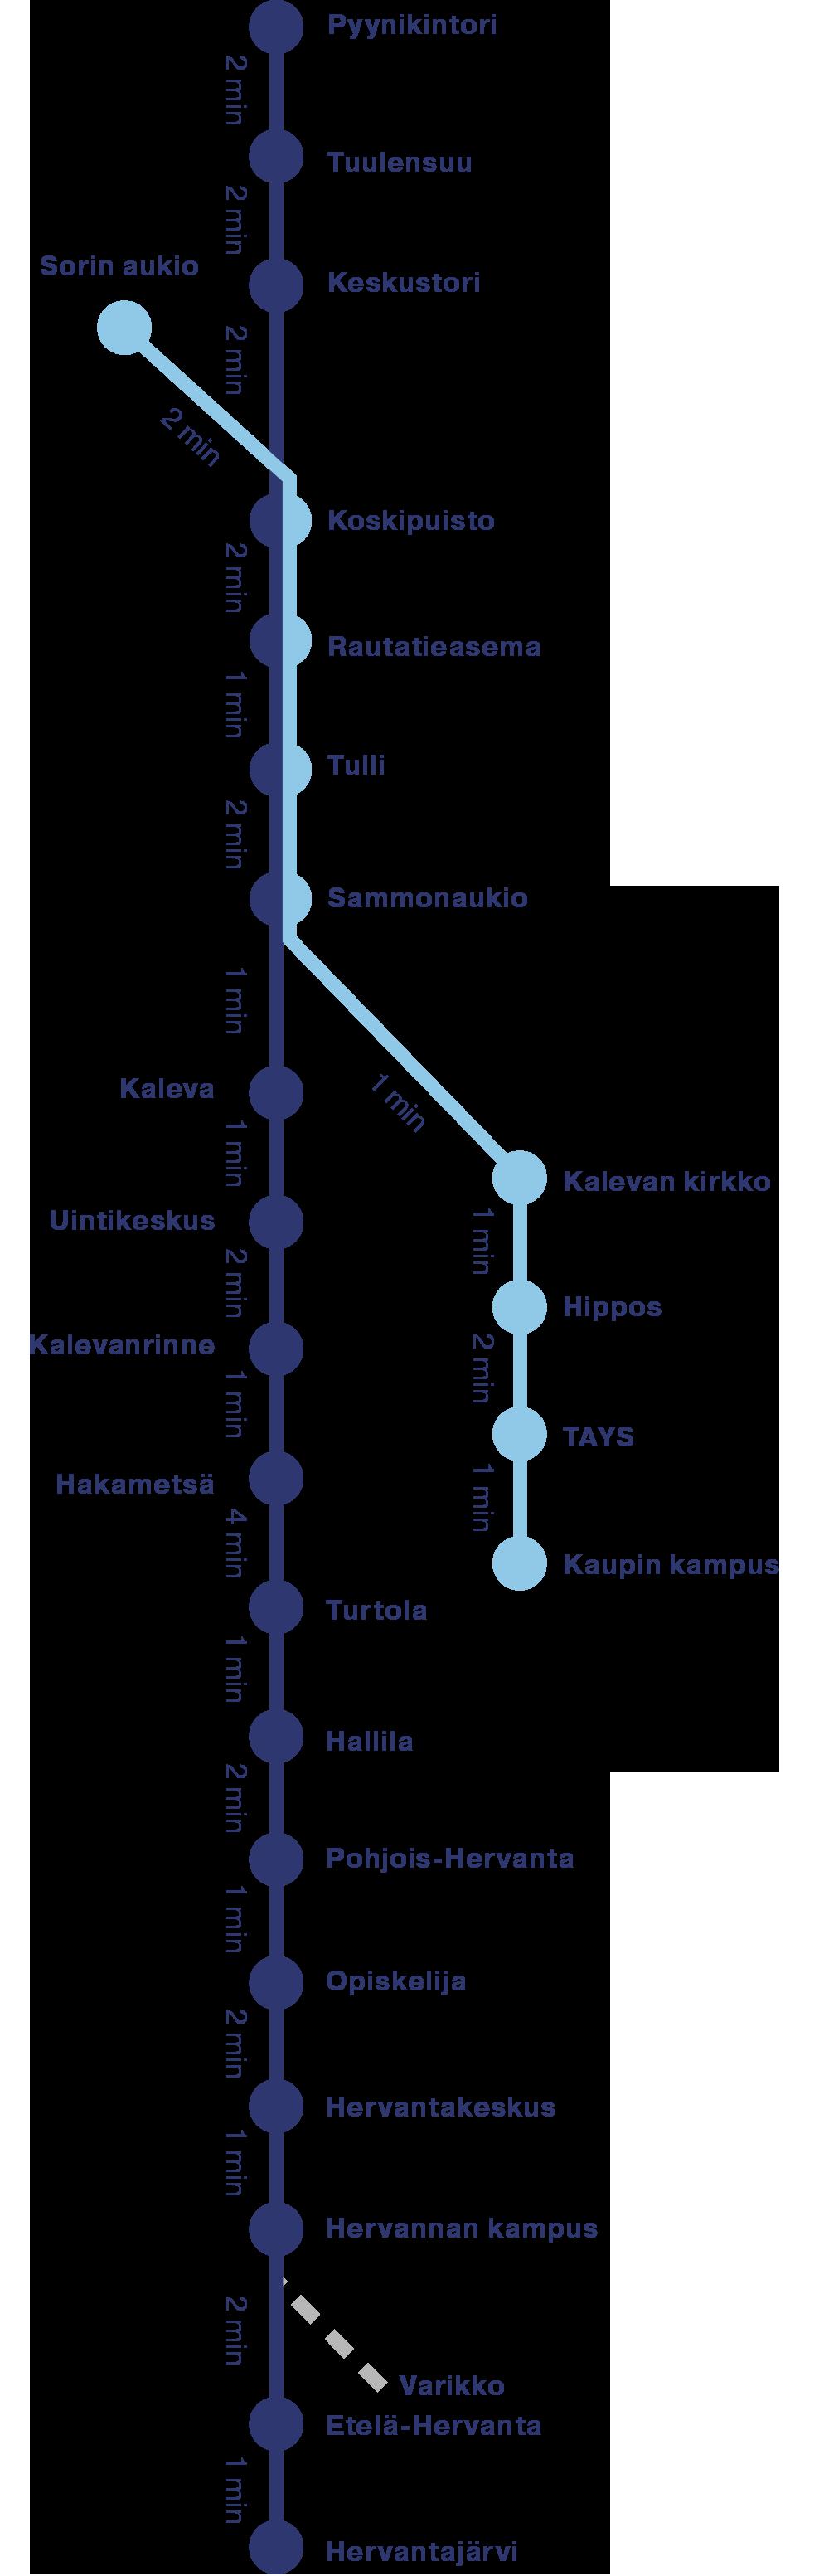 Tampereen Ratikan reitti